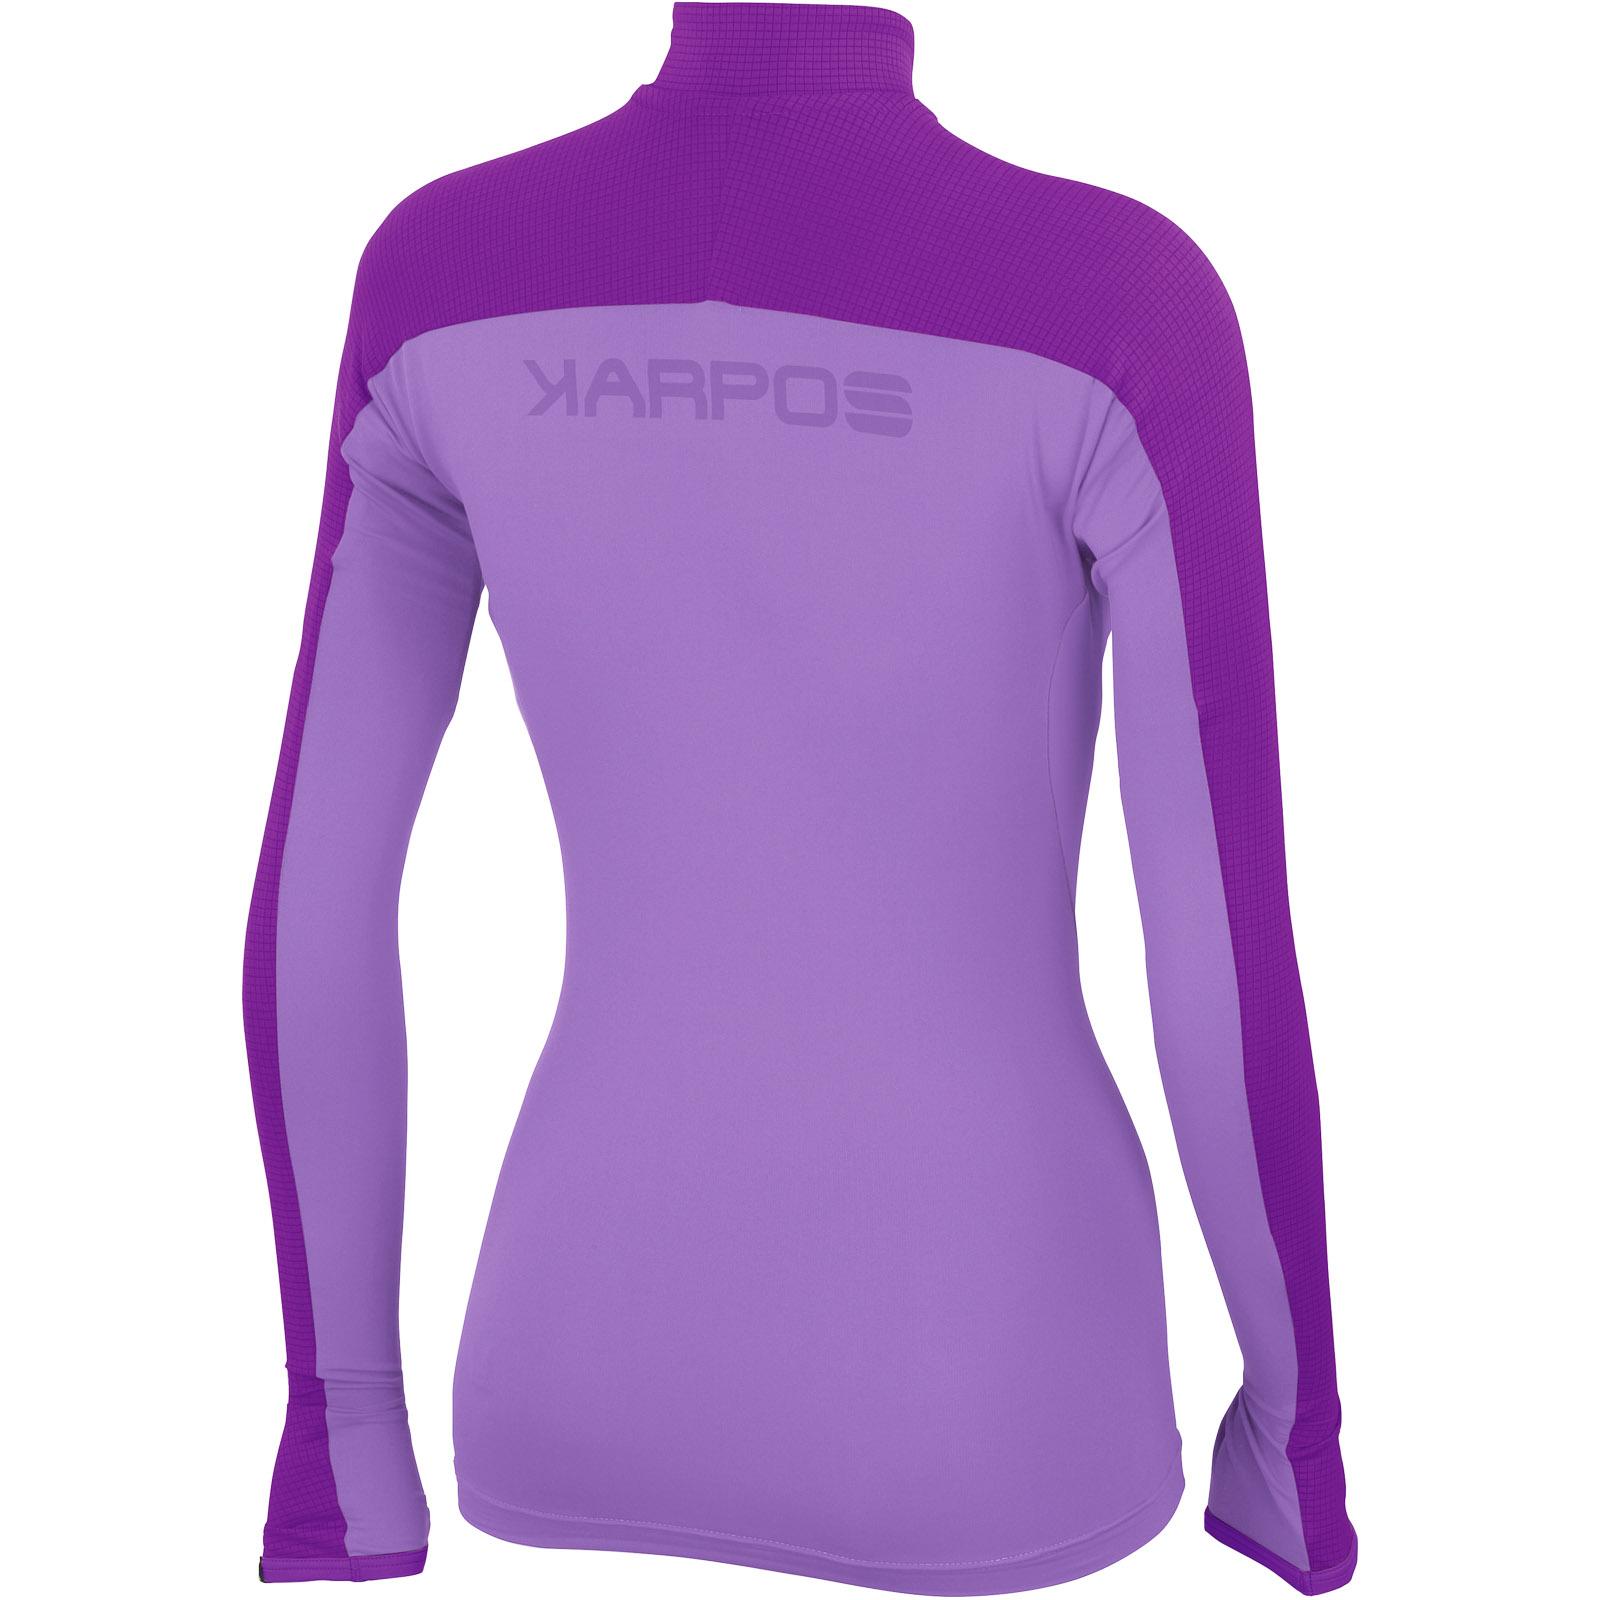 15c202bd763f Karpos RISE dámske tričko s dlhým rukávom fialové